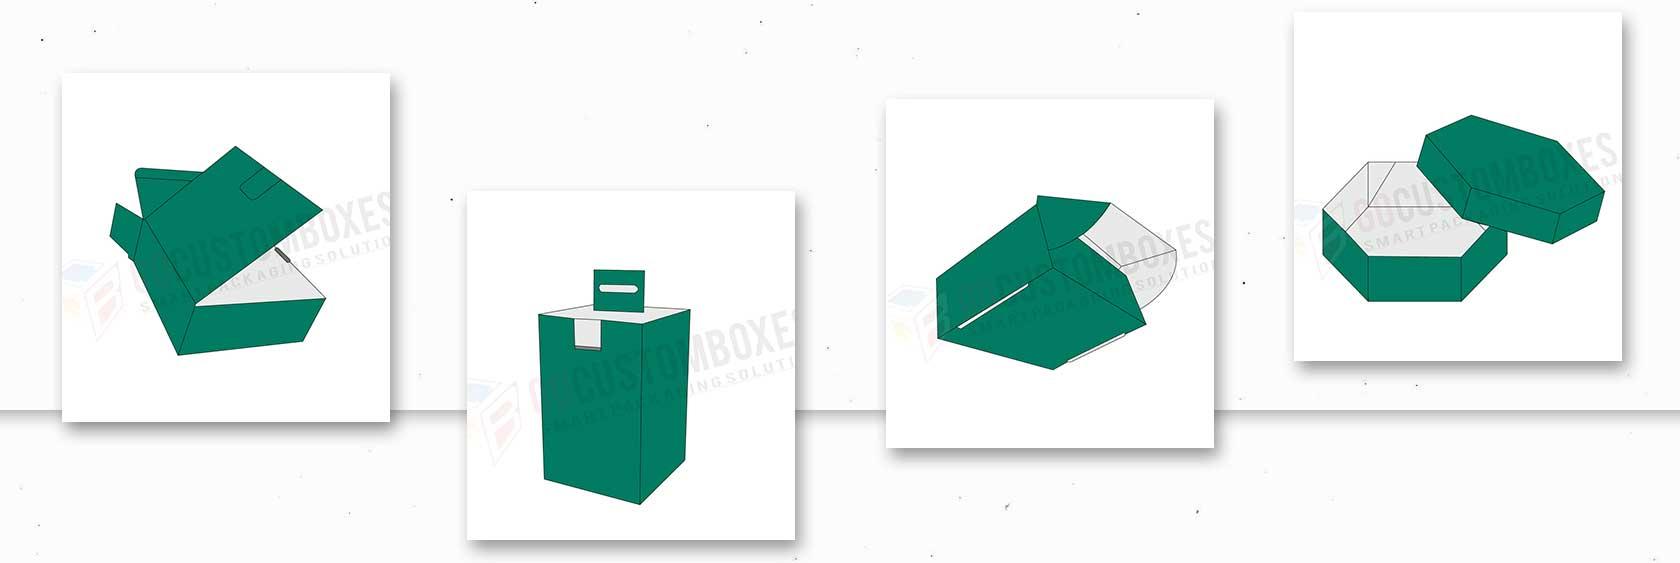 Fold Assemble